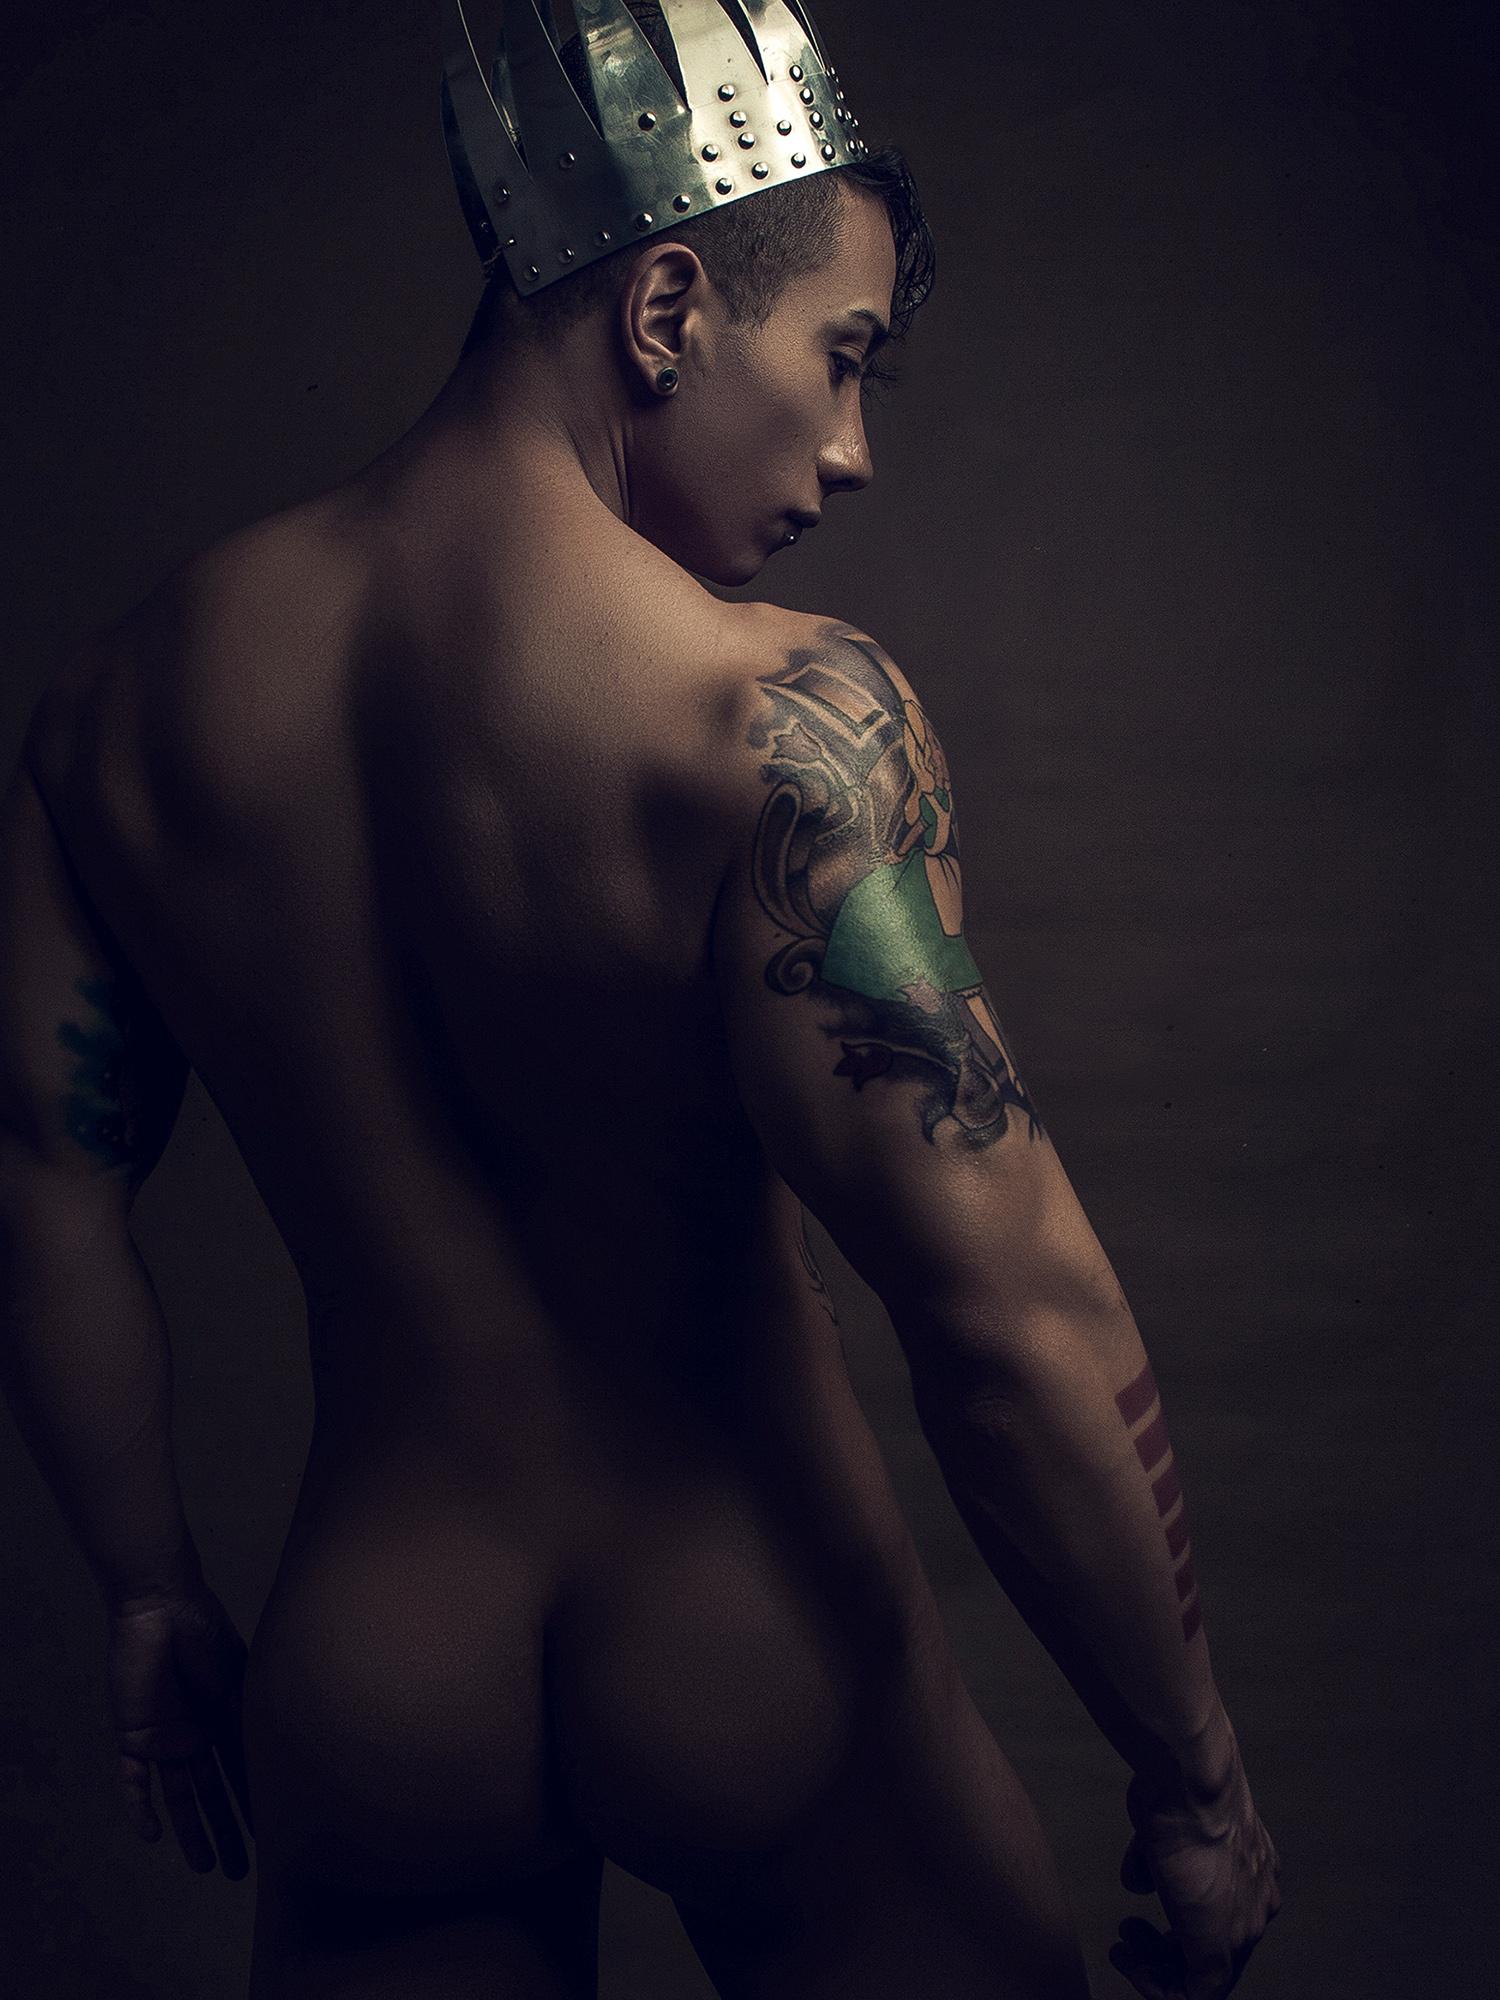 Chris Femat photography